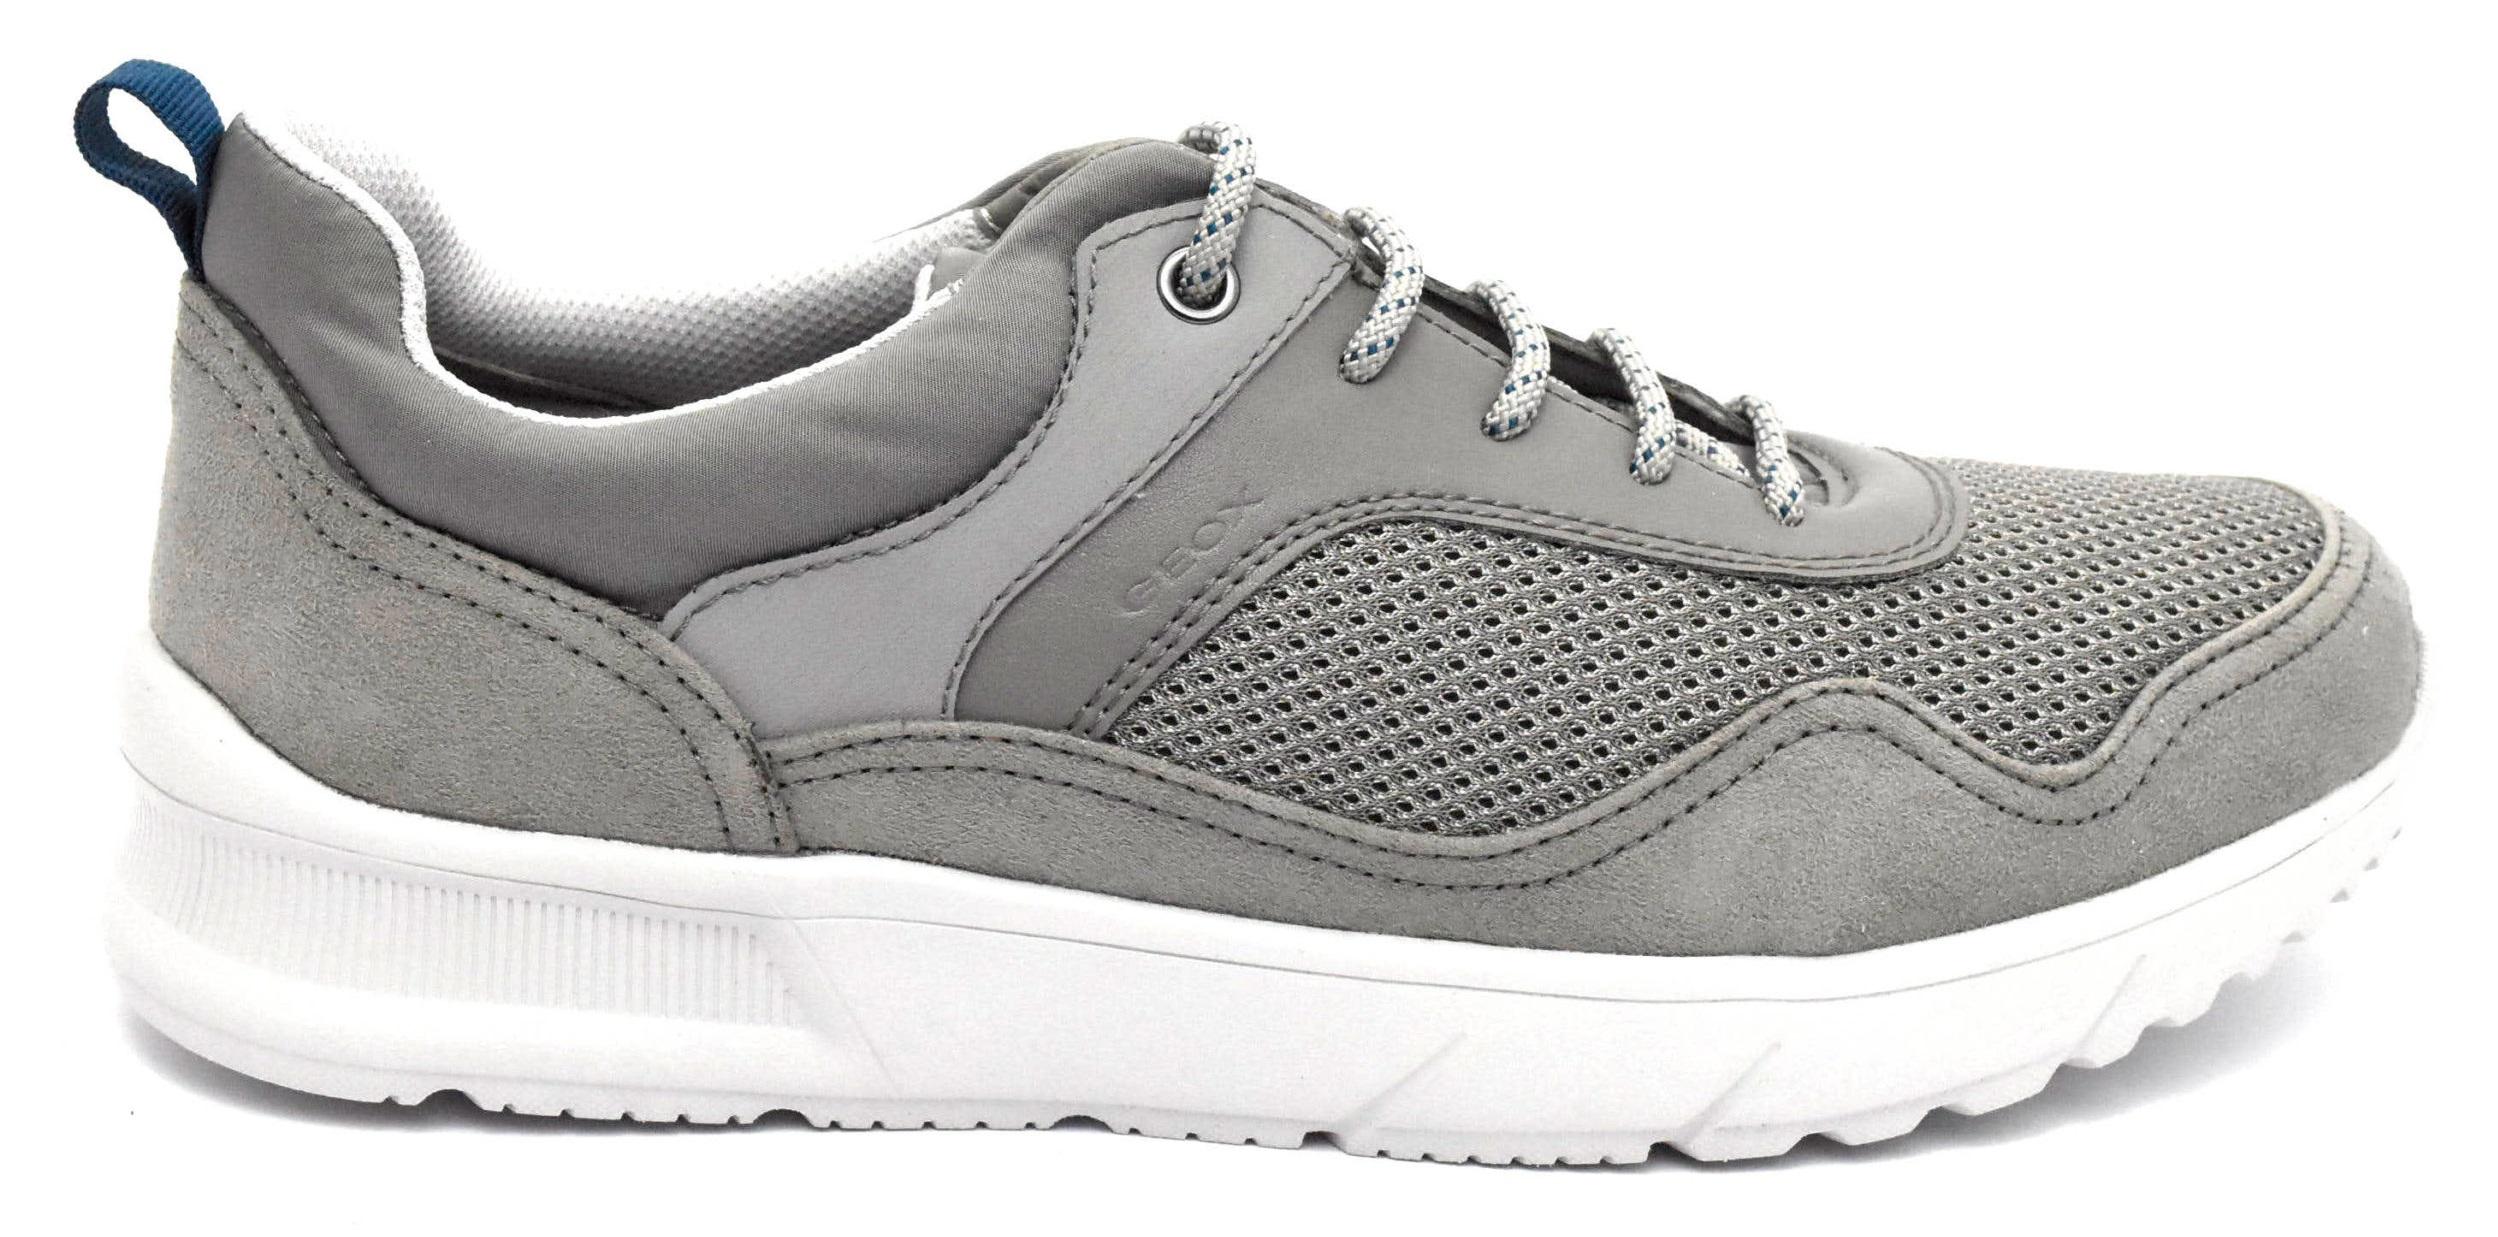 Geox Sneaker Uomo U029UB.014U5.C1006  -8